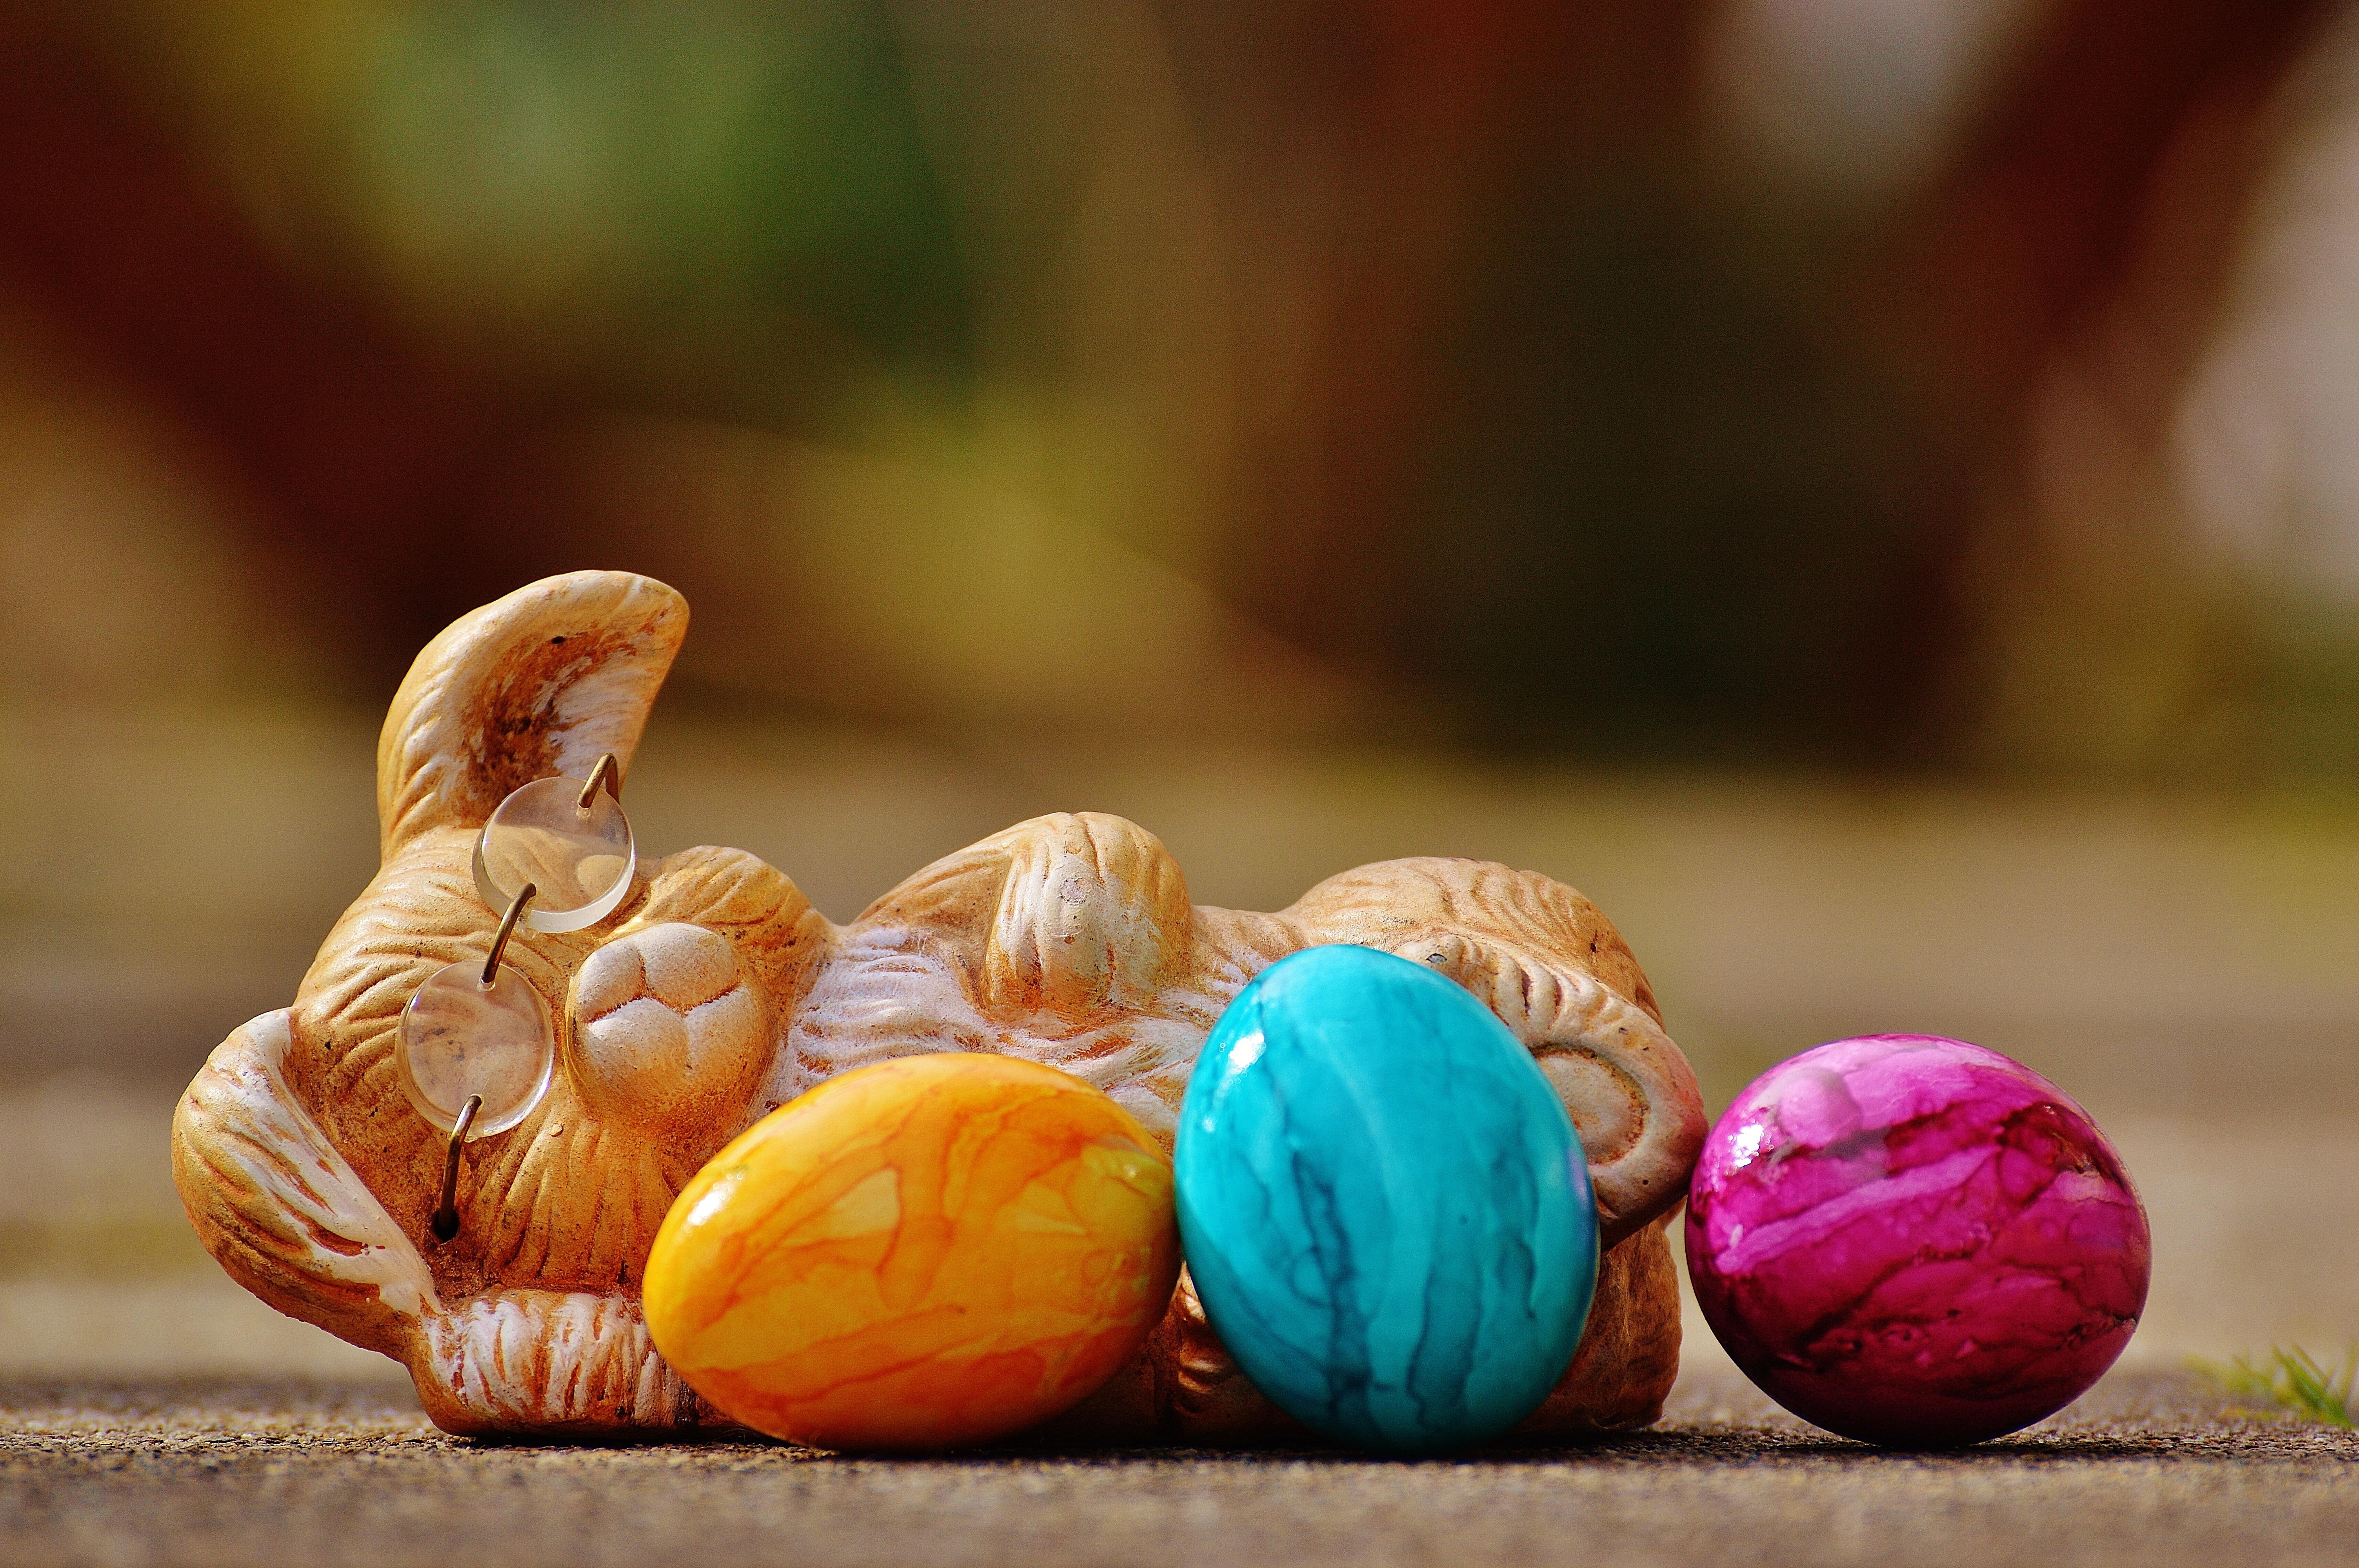 Wallpaper Easter Bunny Eggs 6016x4000